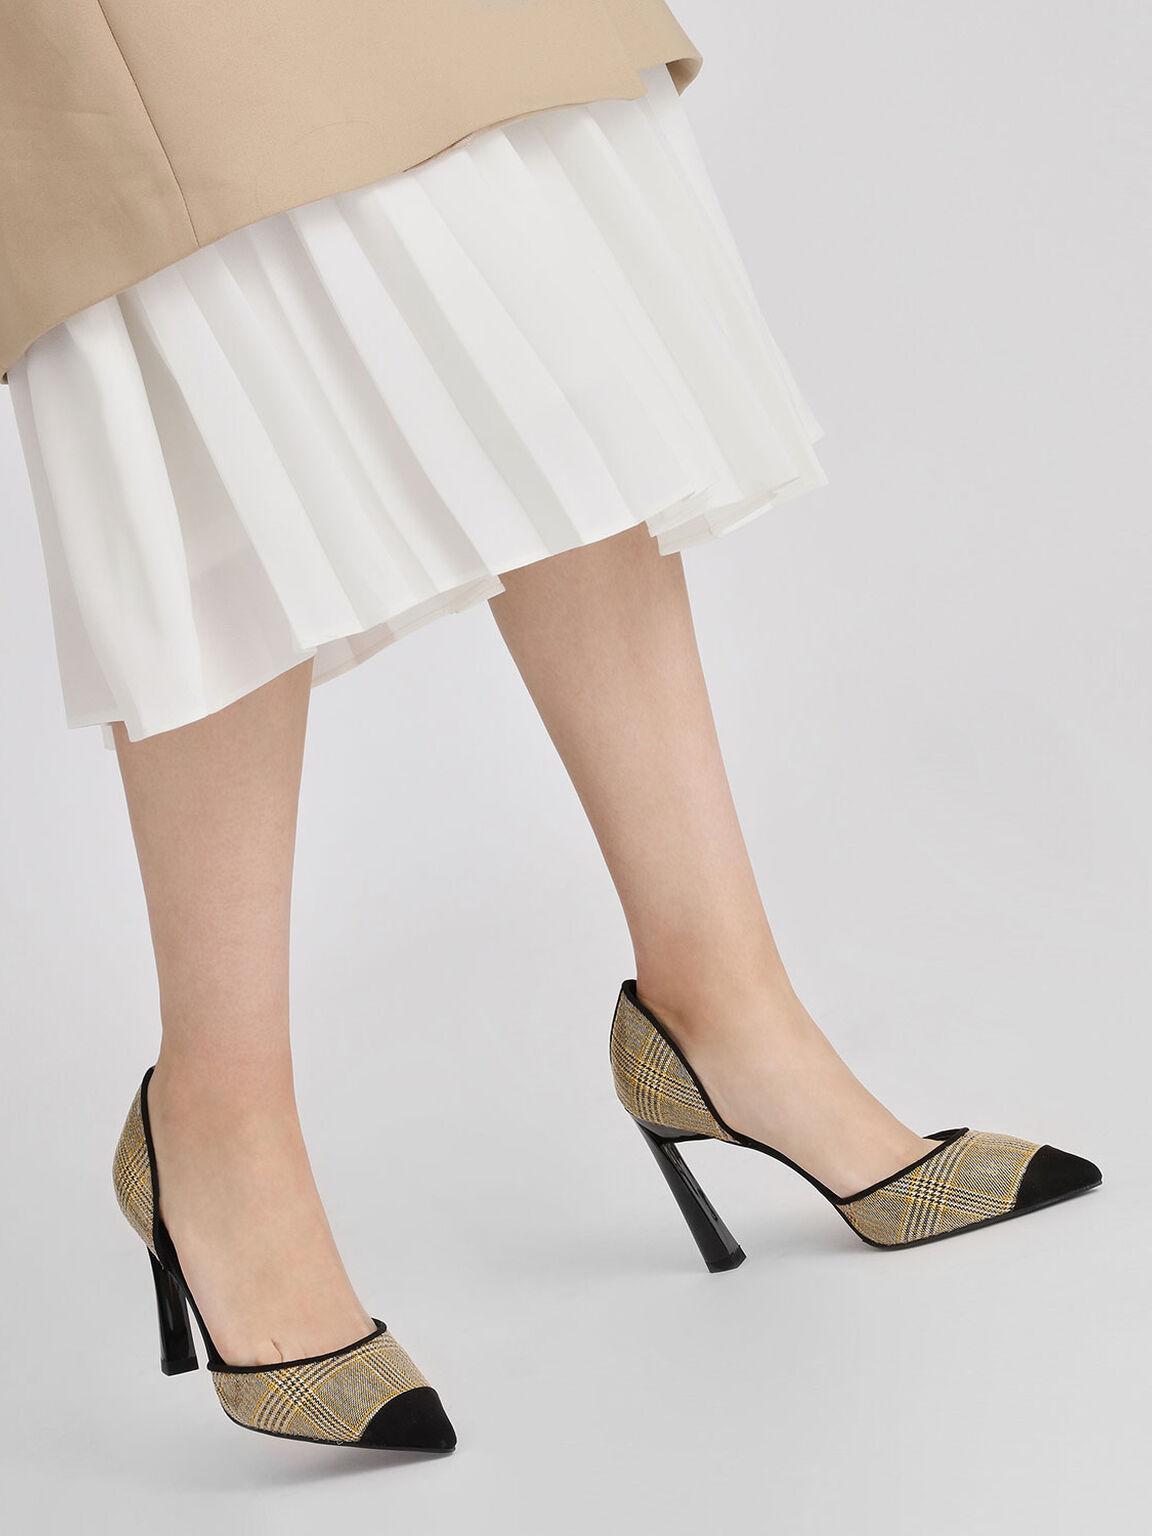 Pointed D'orsay Heels, Mustard, hi-res